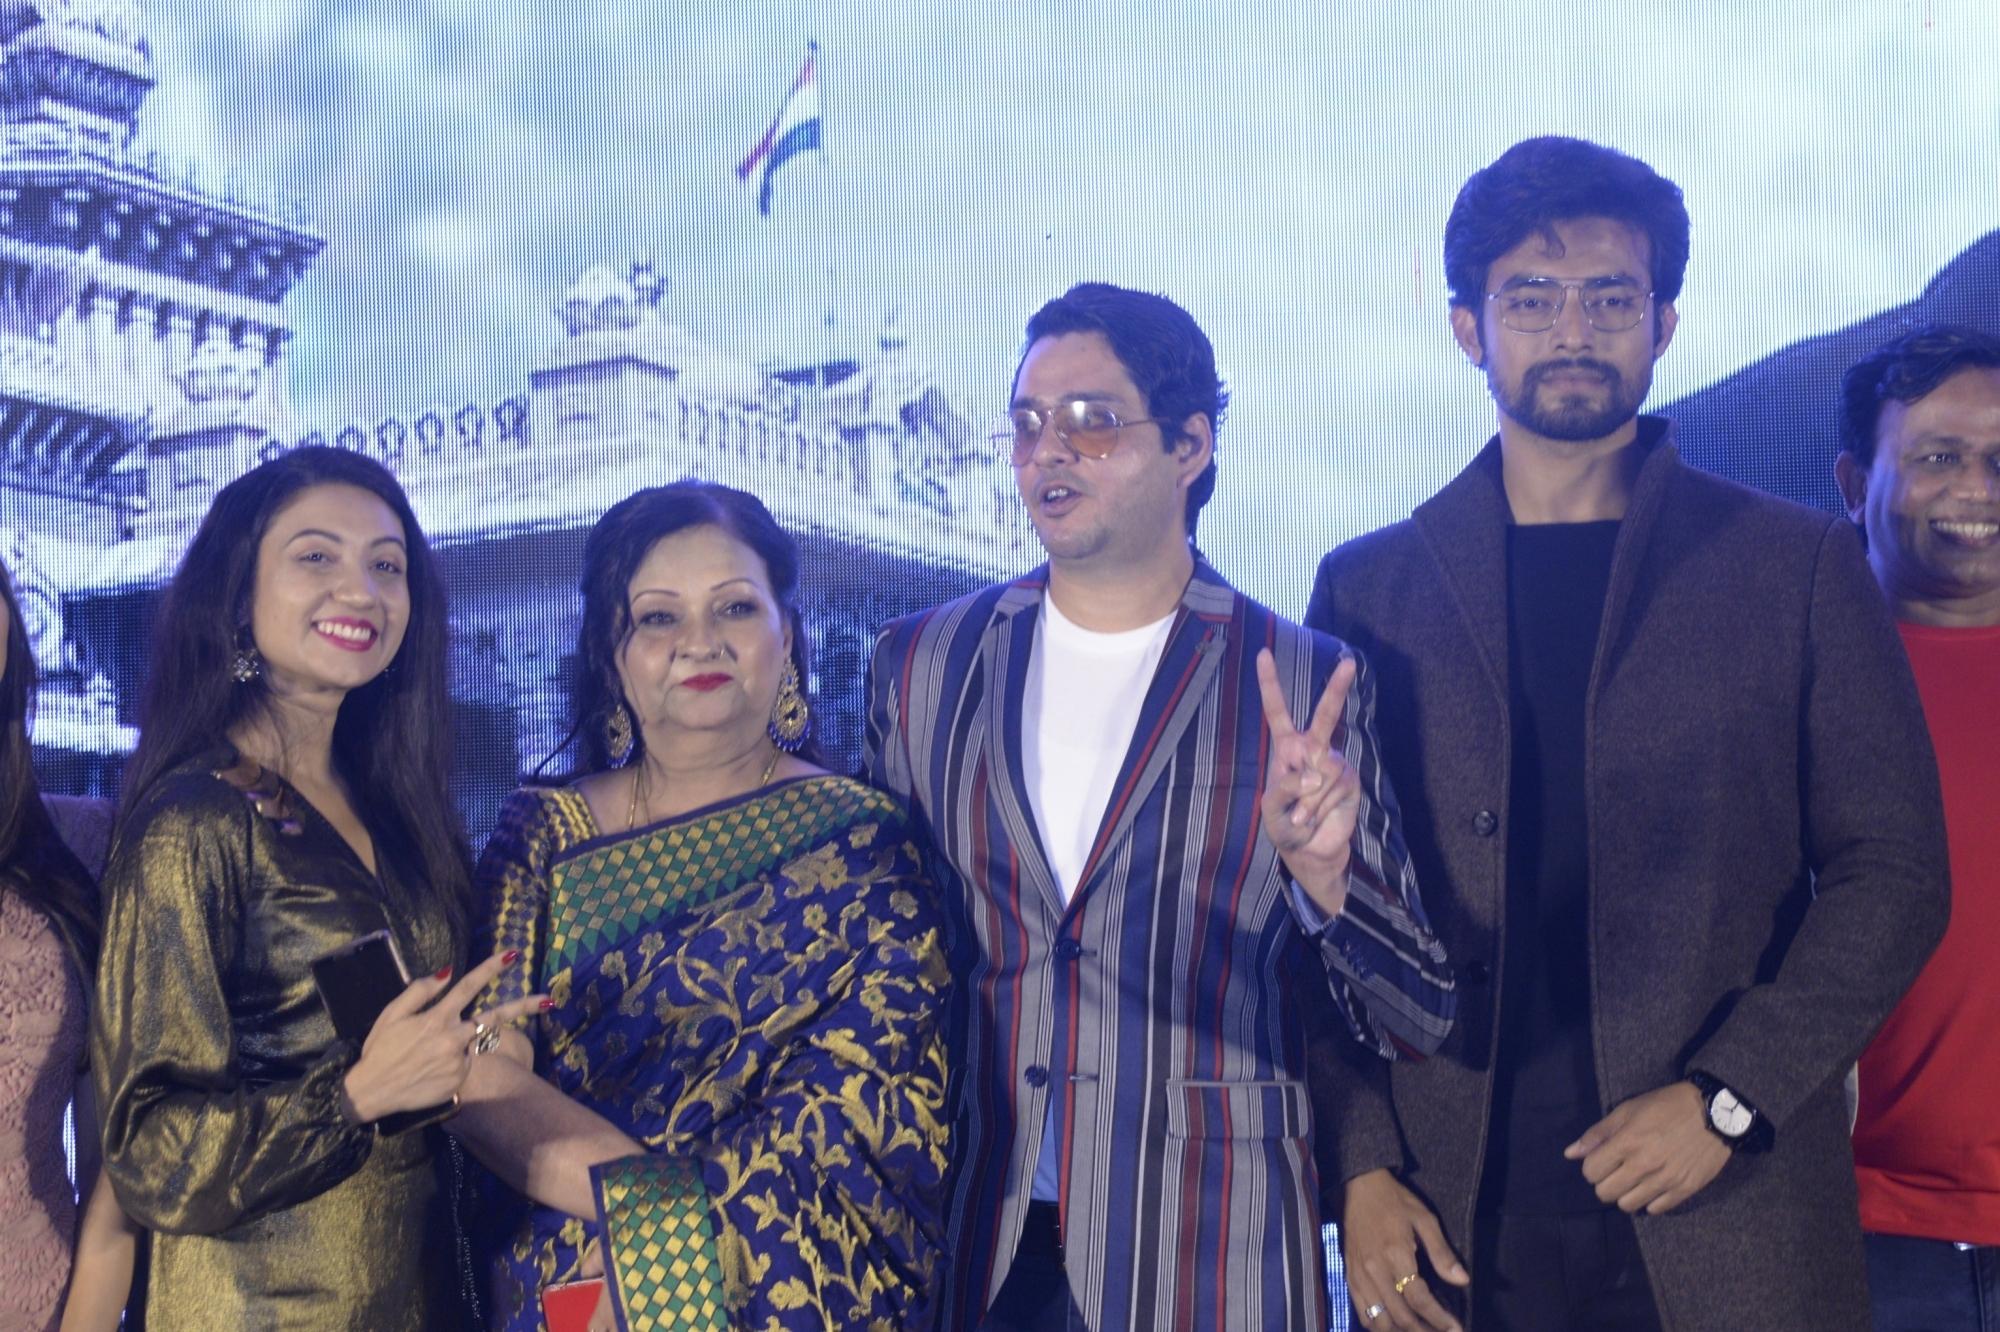 Director Suvendu Raj Ghosh and actors Supriya Karnik and Amyth Sethi at the trailer launch of their upcoming film 'Main Mulyam Singh Yadav', in Kolkata